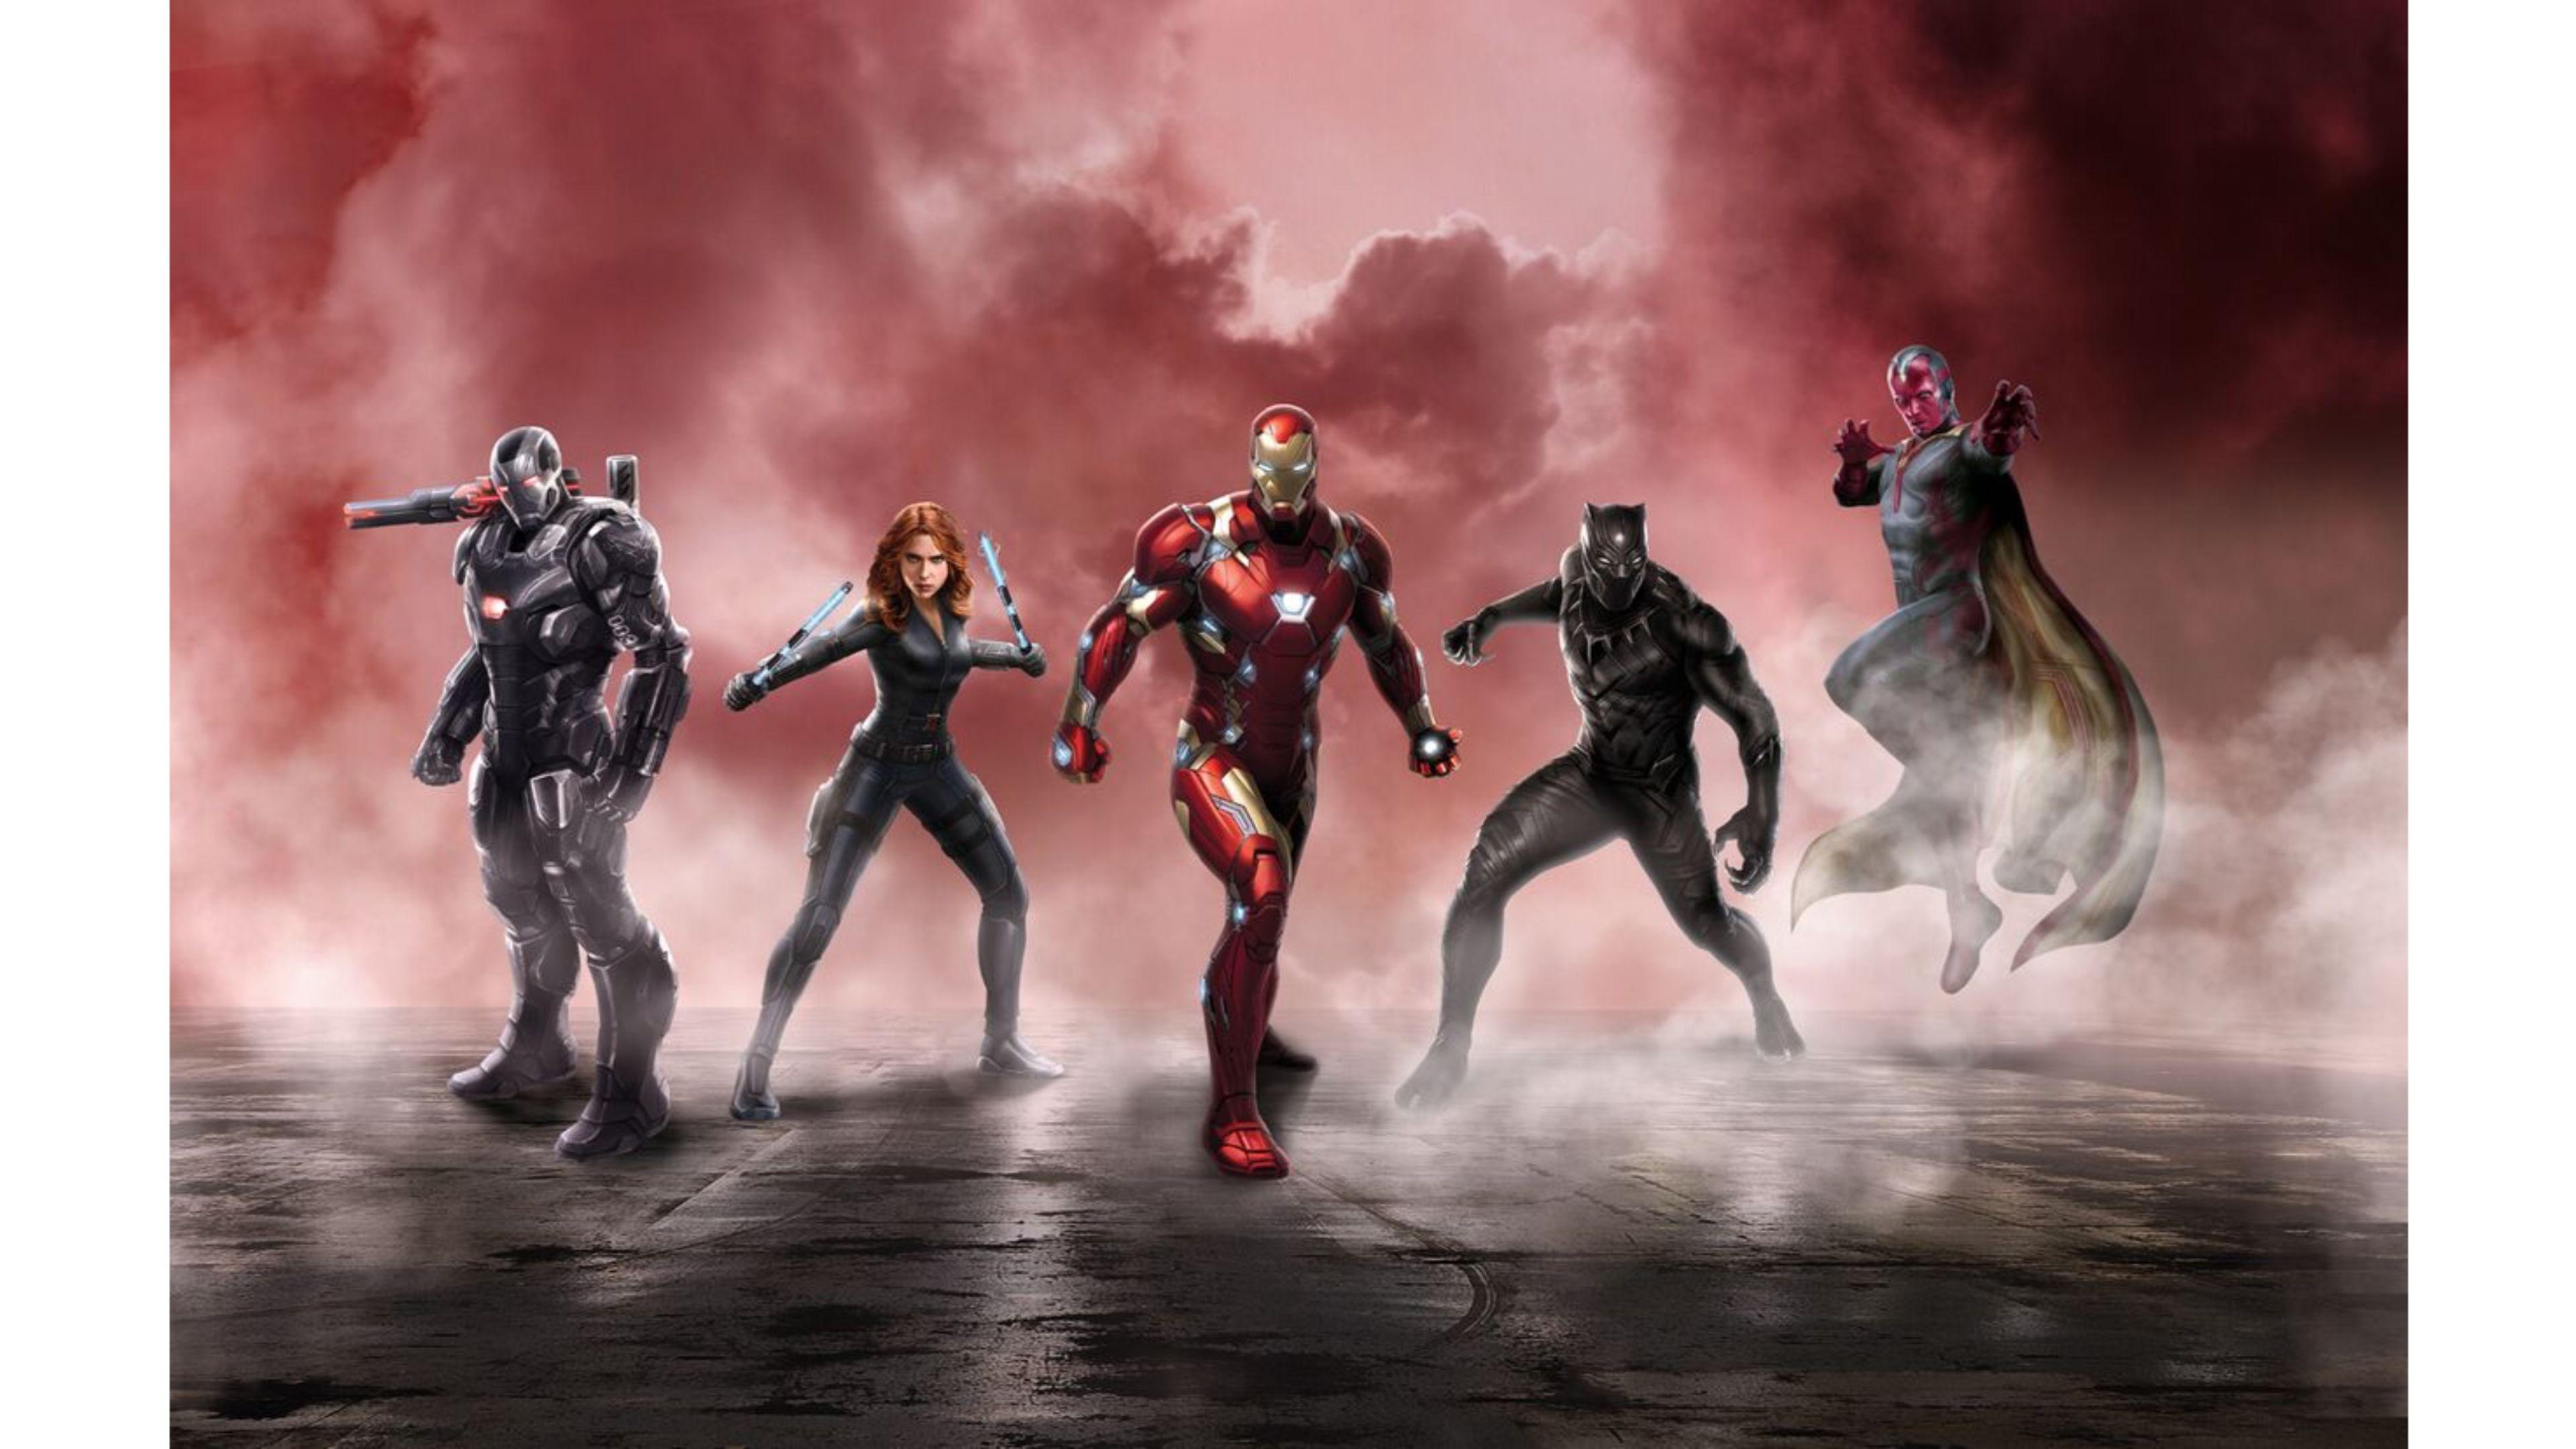 Captain America Civil War 4k: Captain Wallpapers, Photos And Desktop Backgrounds Up To